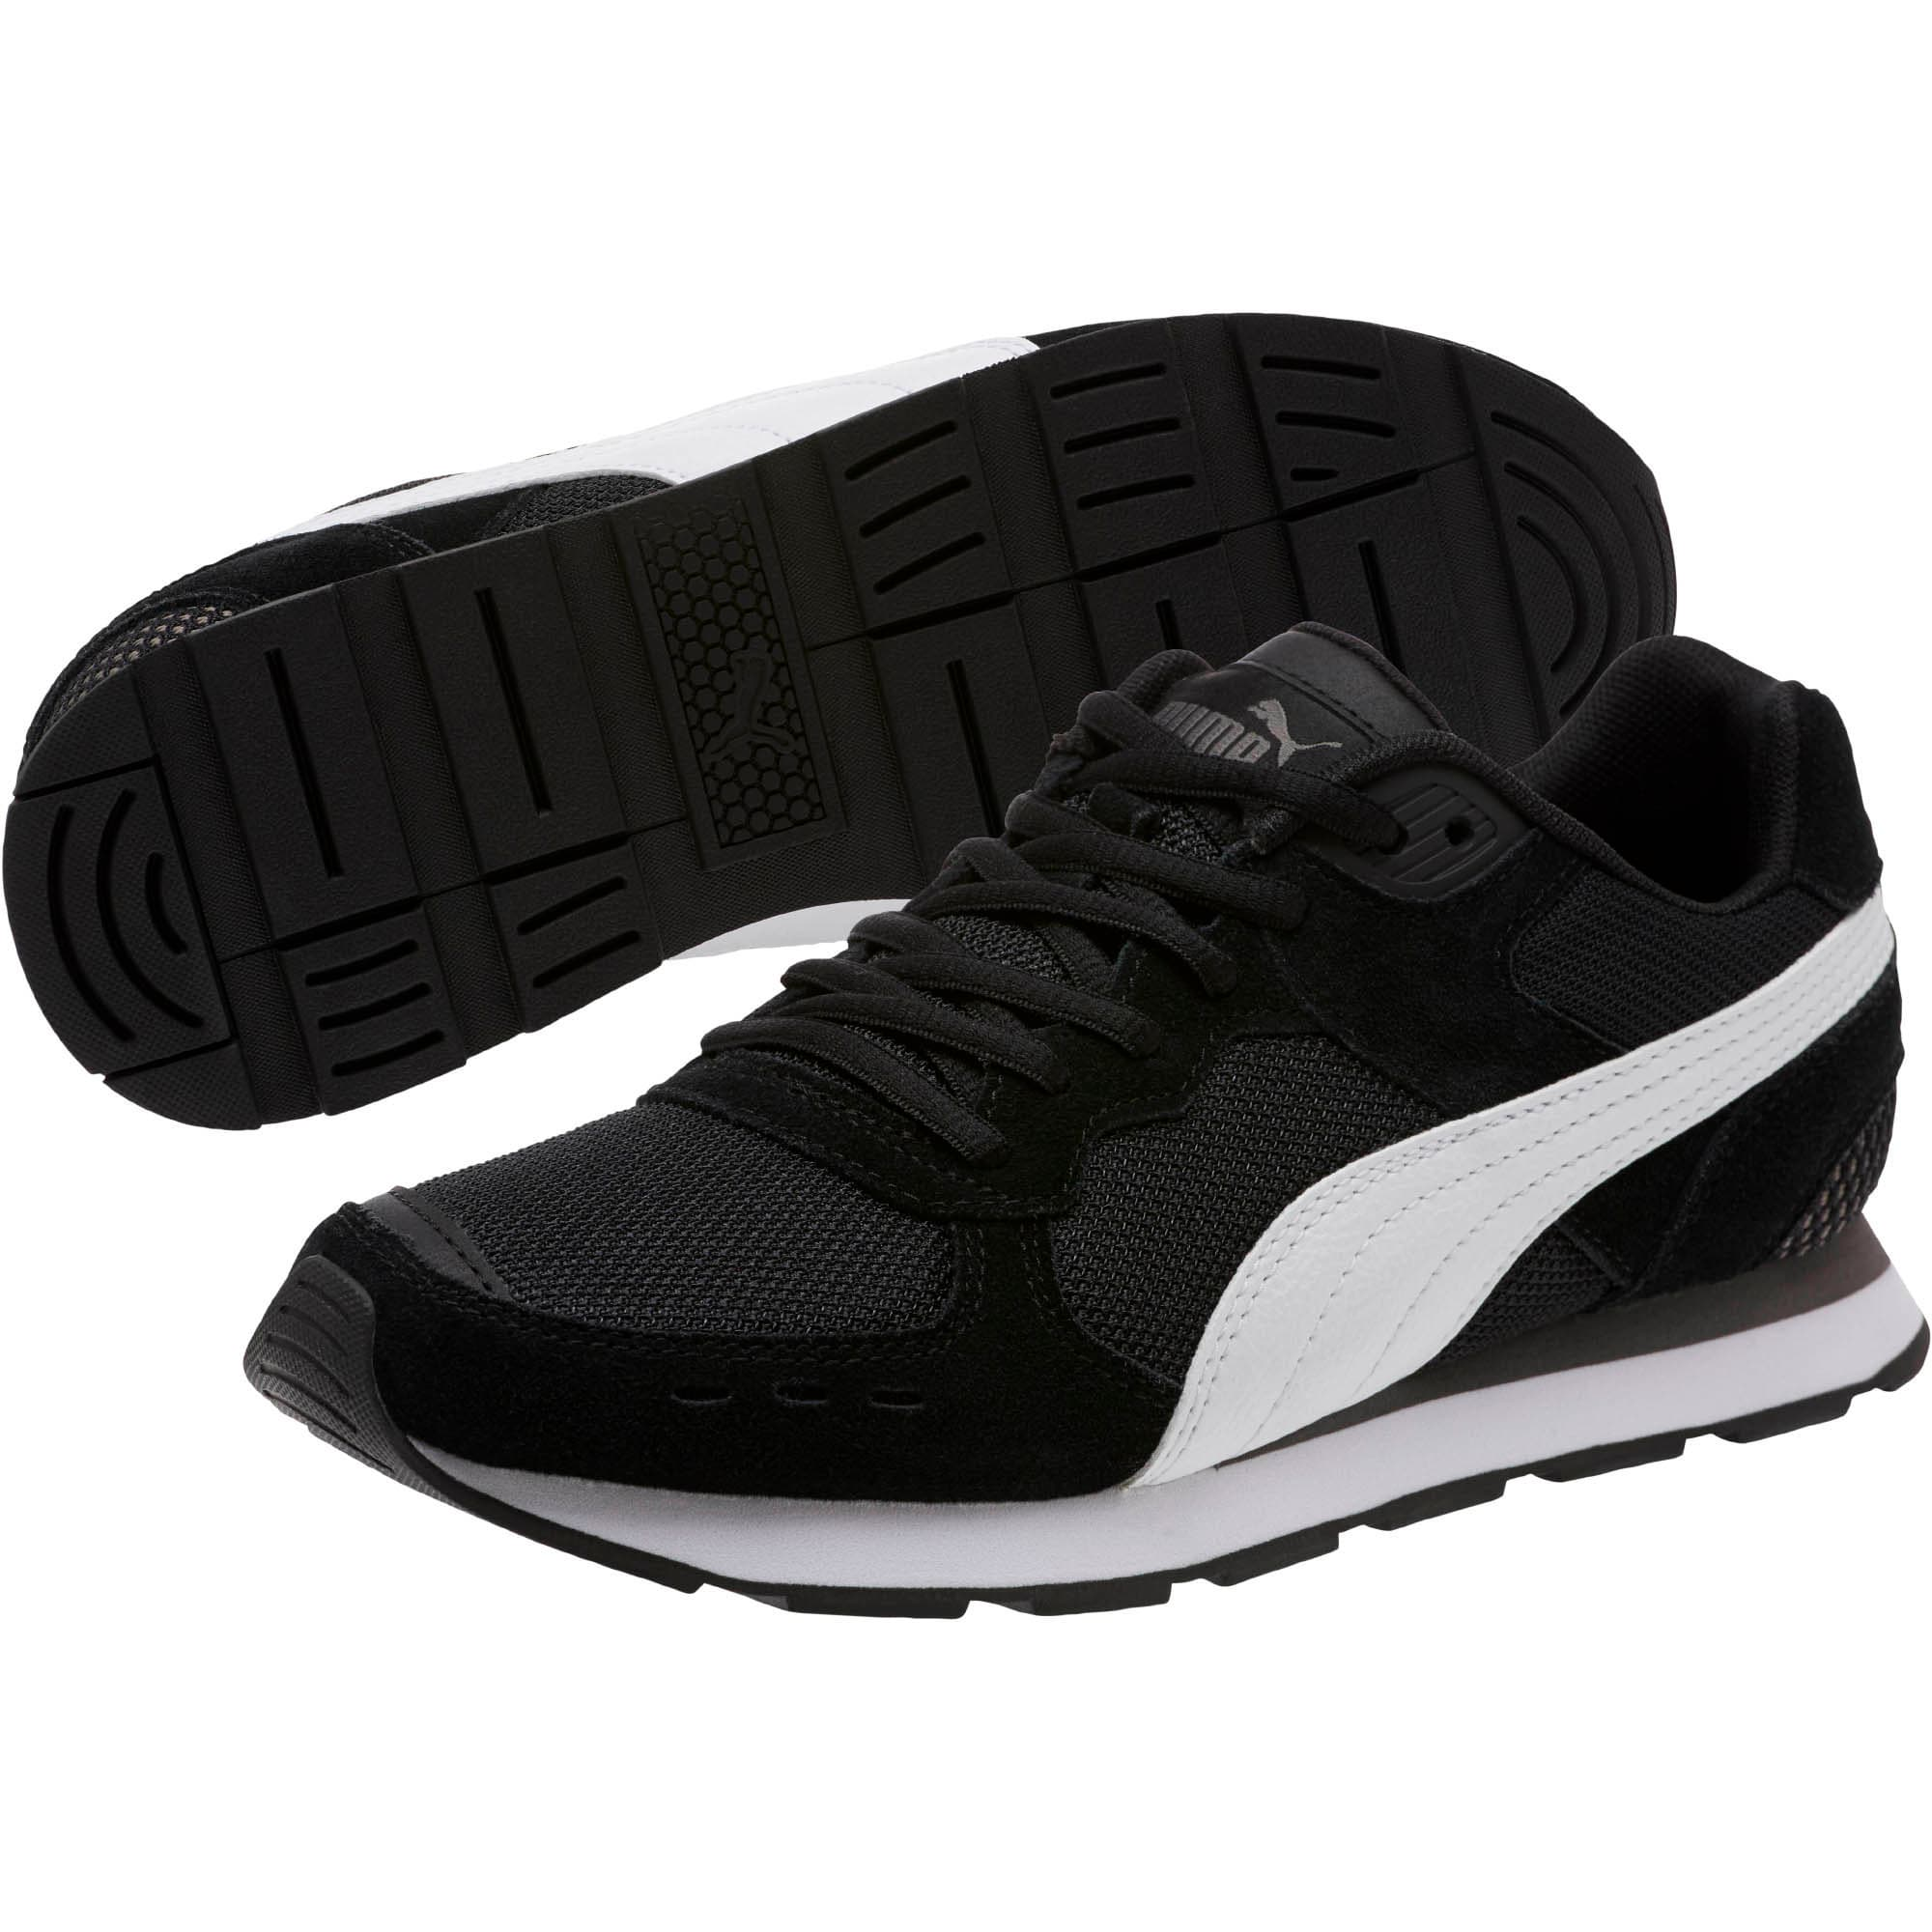 Thumbnail 2 of Vista Women's Sneakers, Black-White-Charcoal Gray, medium